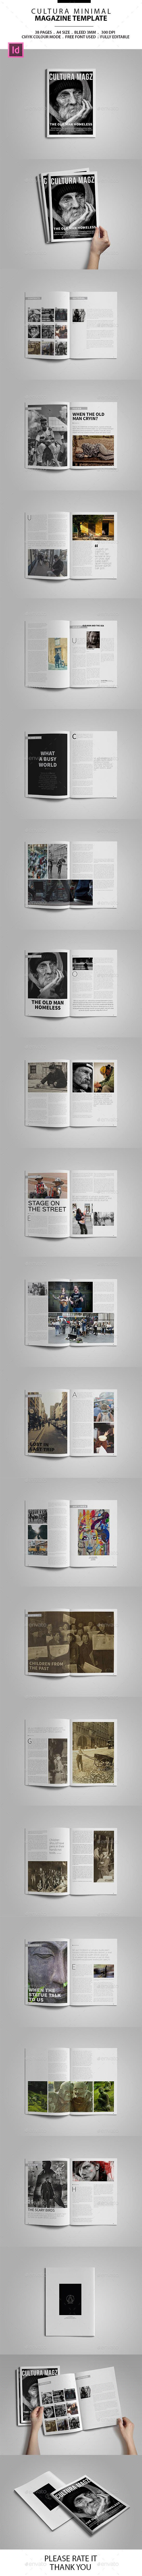 Cultura Minimal Magazine Template - Magazines Print Templates